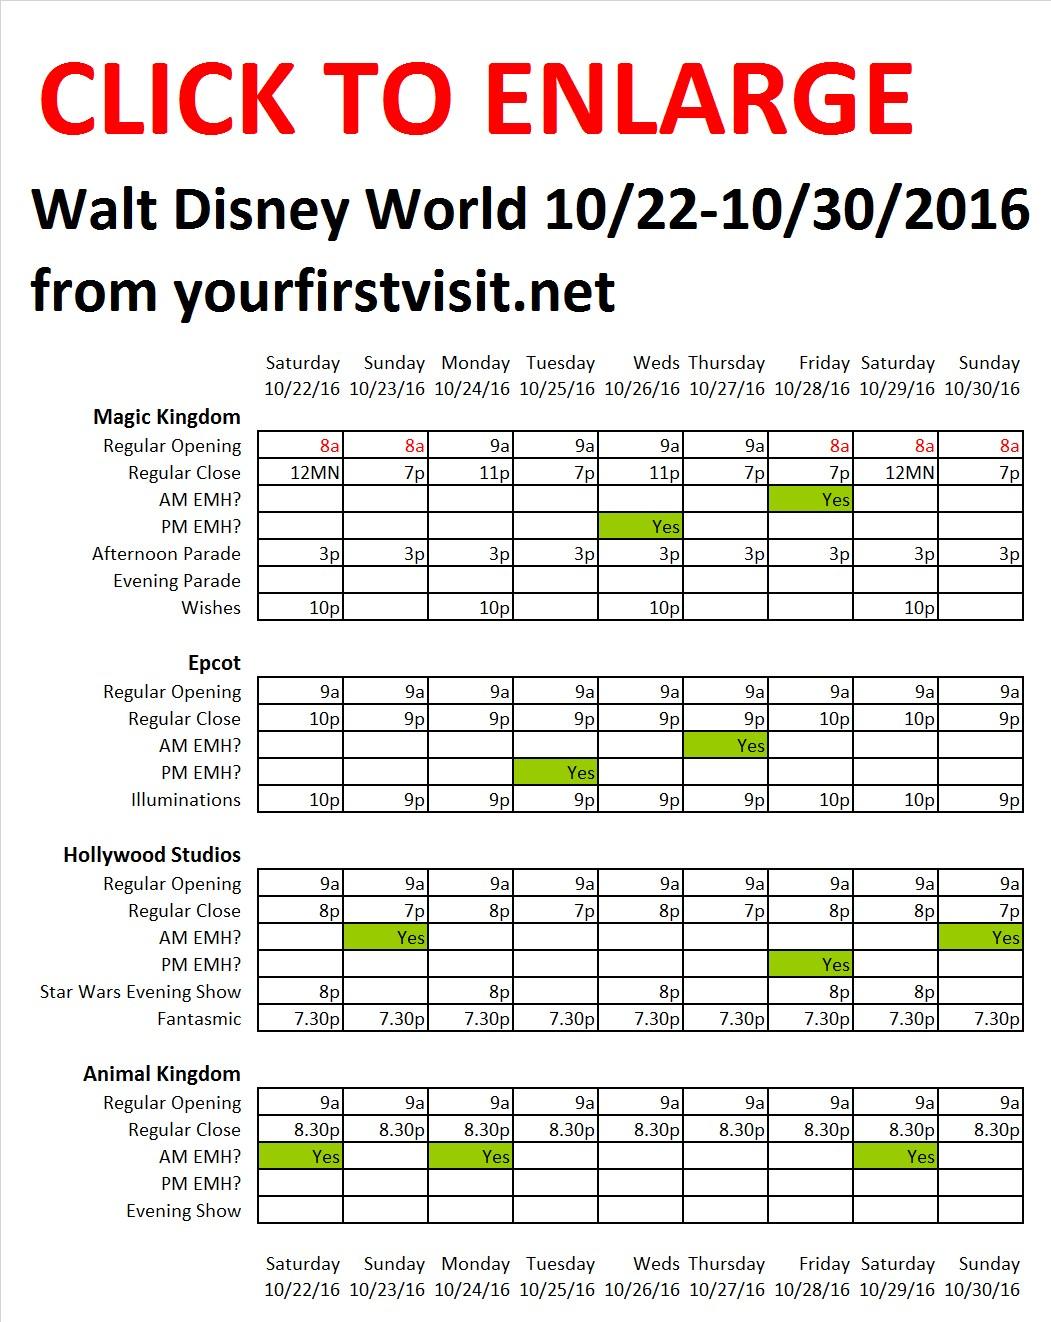 disney-world-10-22-to-10-30-2016-from-yourfirstvisit-net